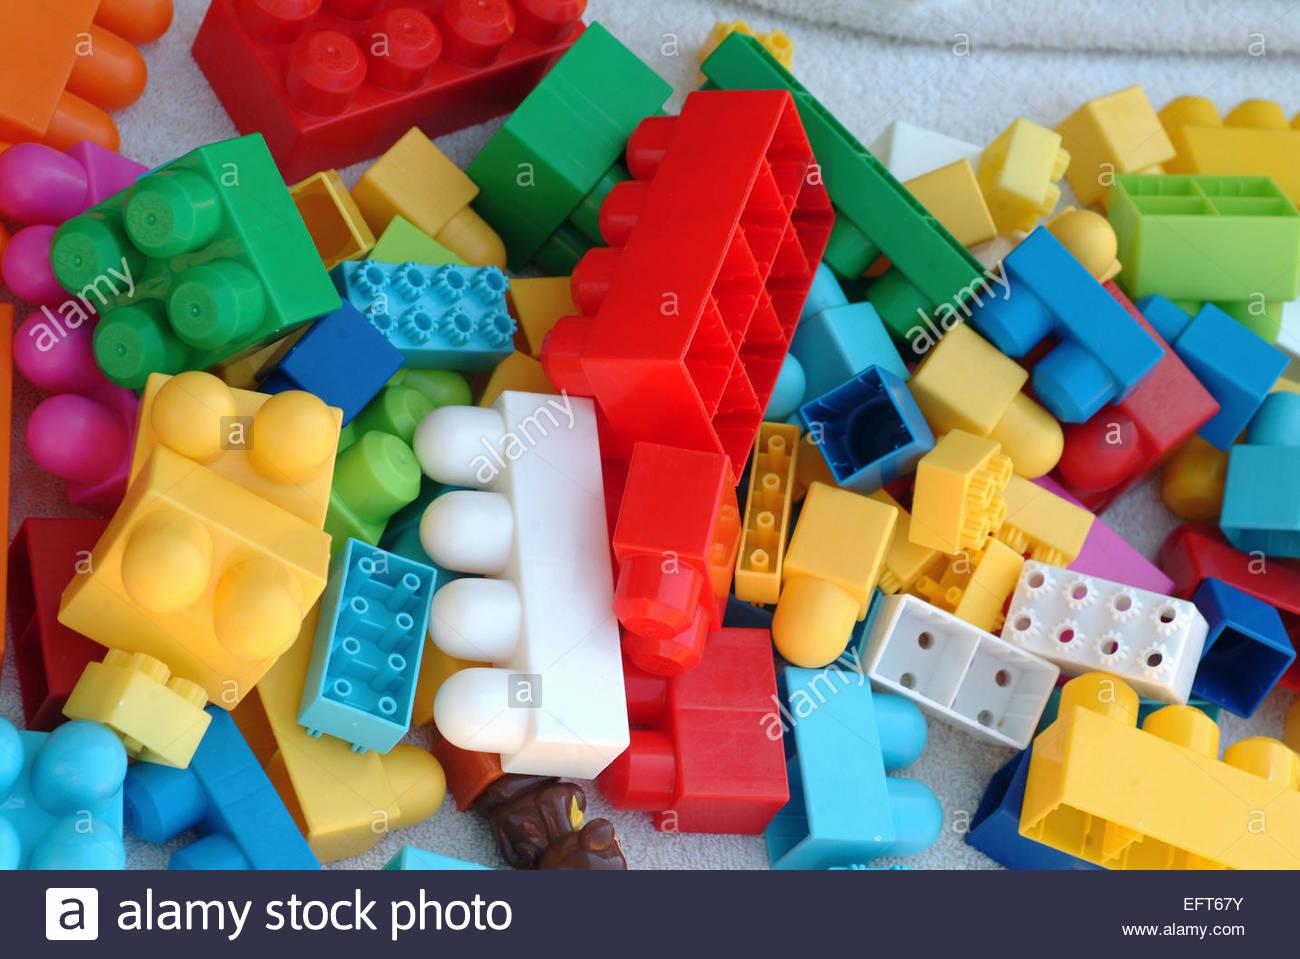 Educational Toys Age 2 : Preschooler boys playing toy blocks stock photos & preschooler boys